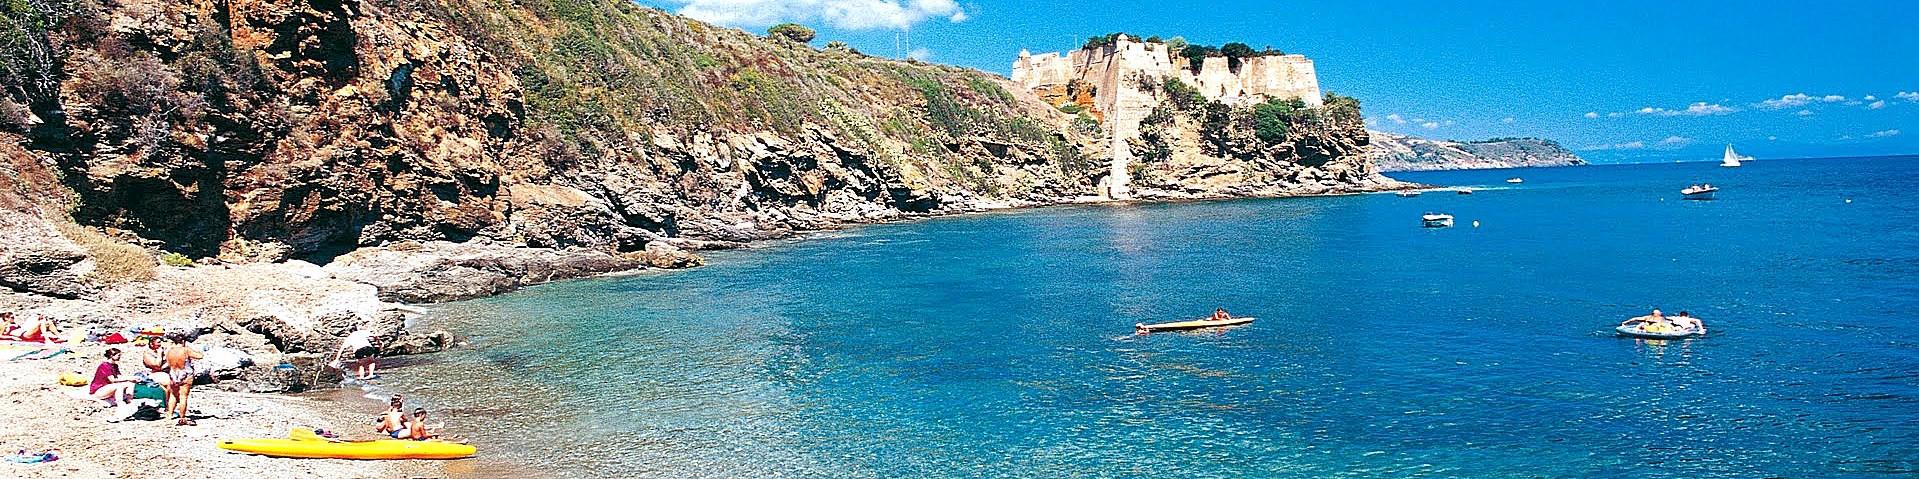 Capoliveri, pláž Capo Perla